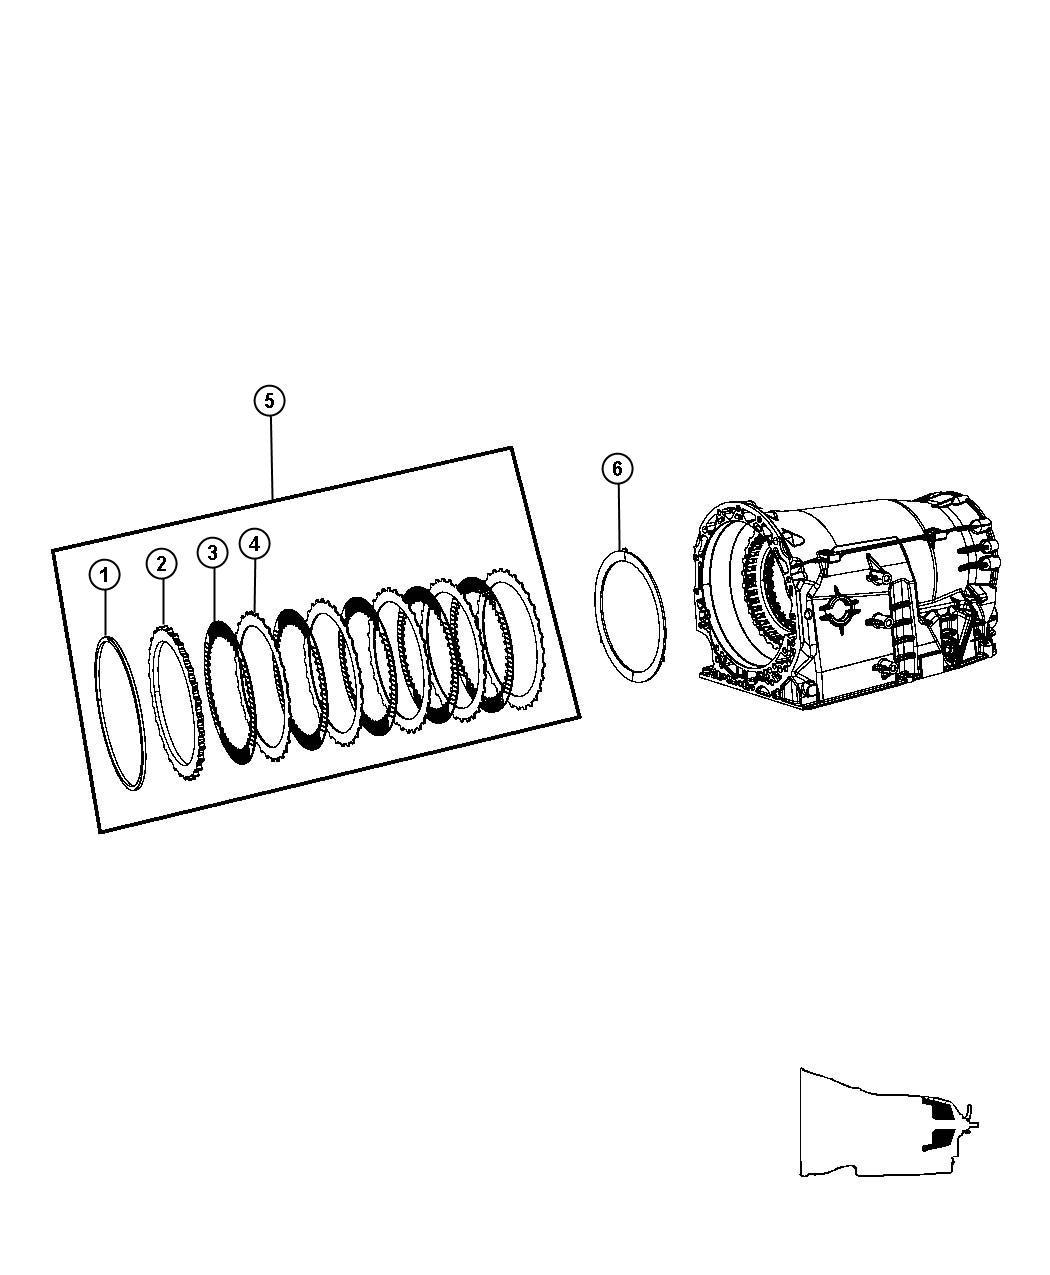 Jeep Grand Cherokee Clutch package. B3 brake clutch stack